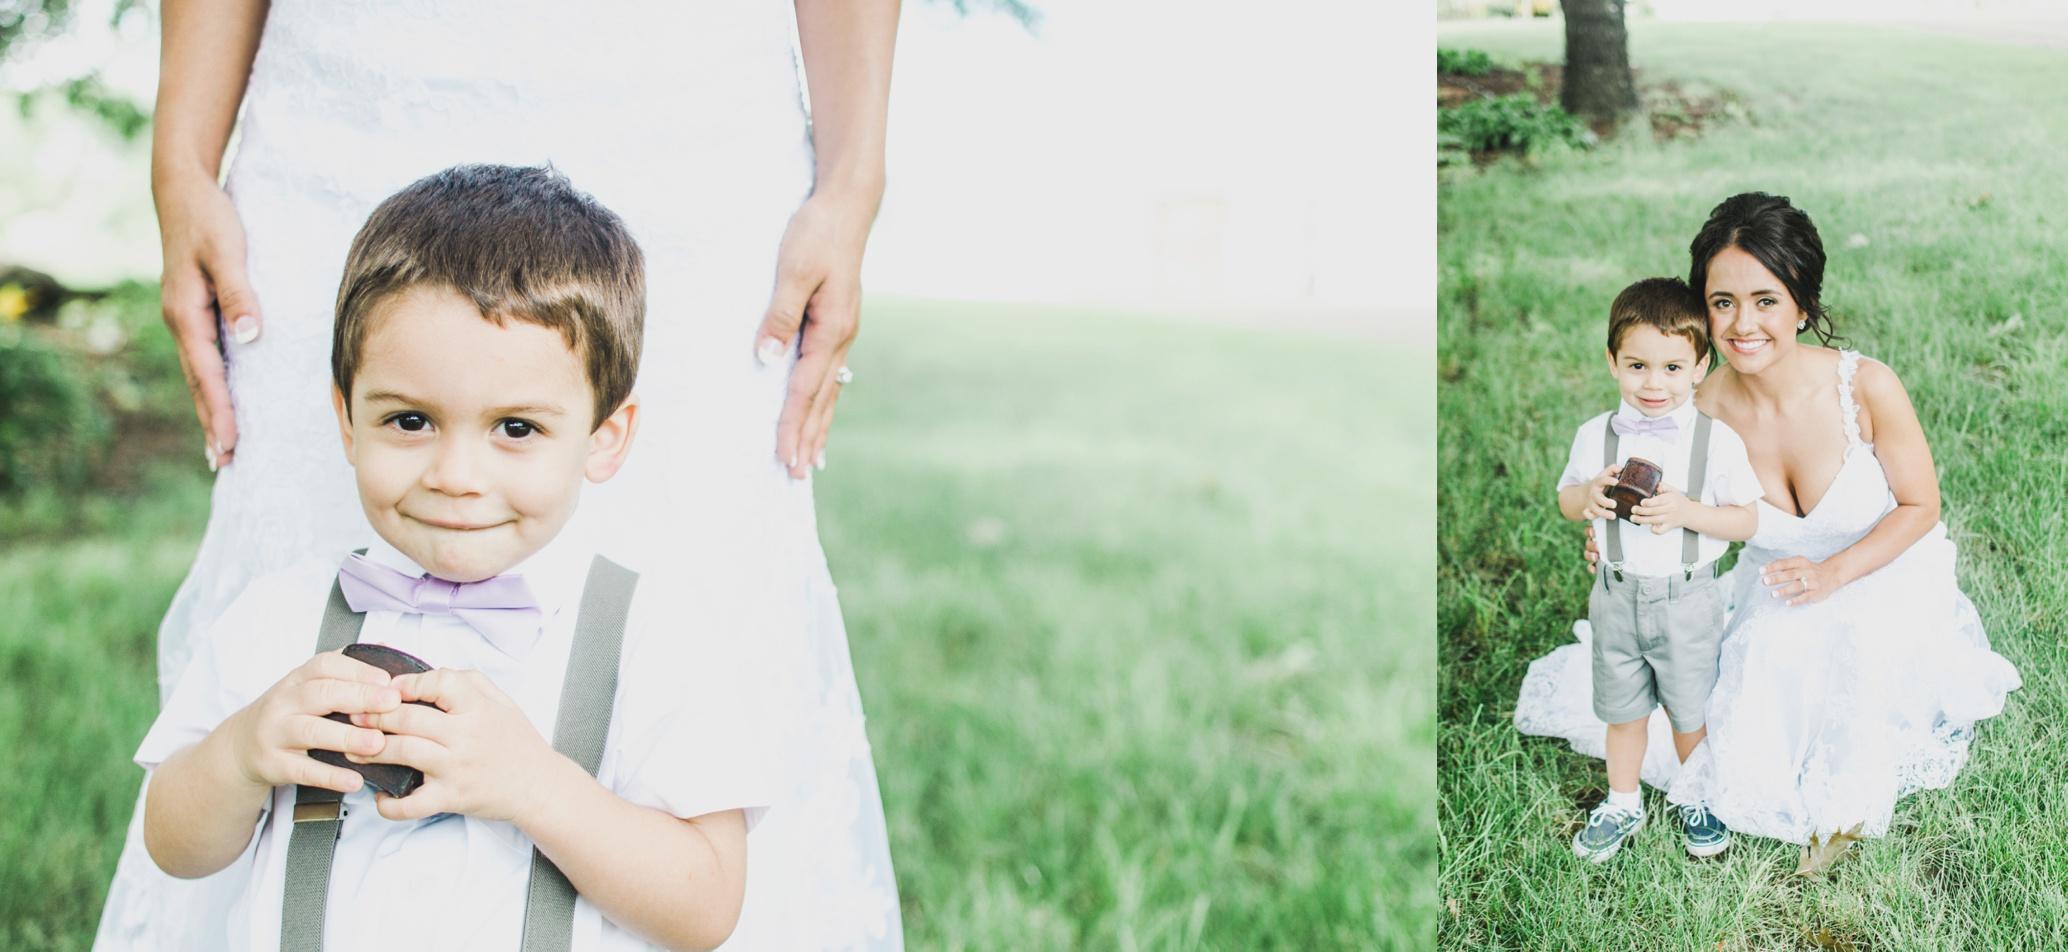 Barnes' Place Rustic Outdoor Wedding | Ali Leigh Photo Minneapolis Wedding Photographer_0124.jpg